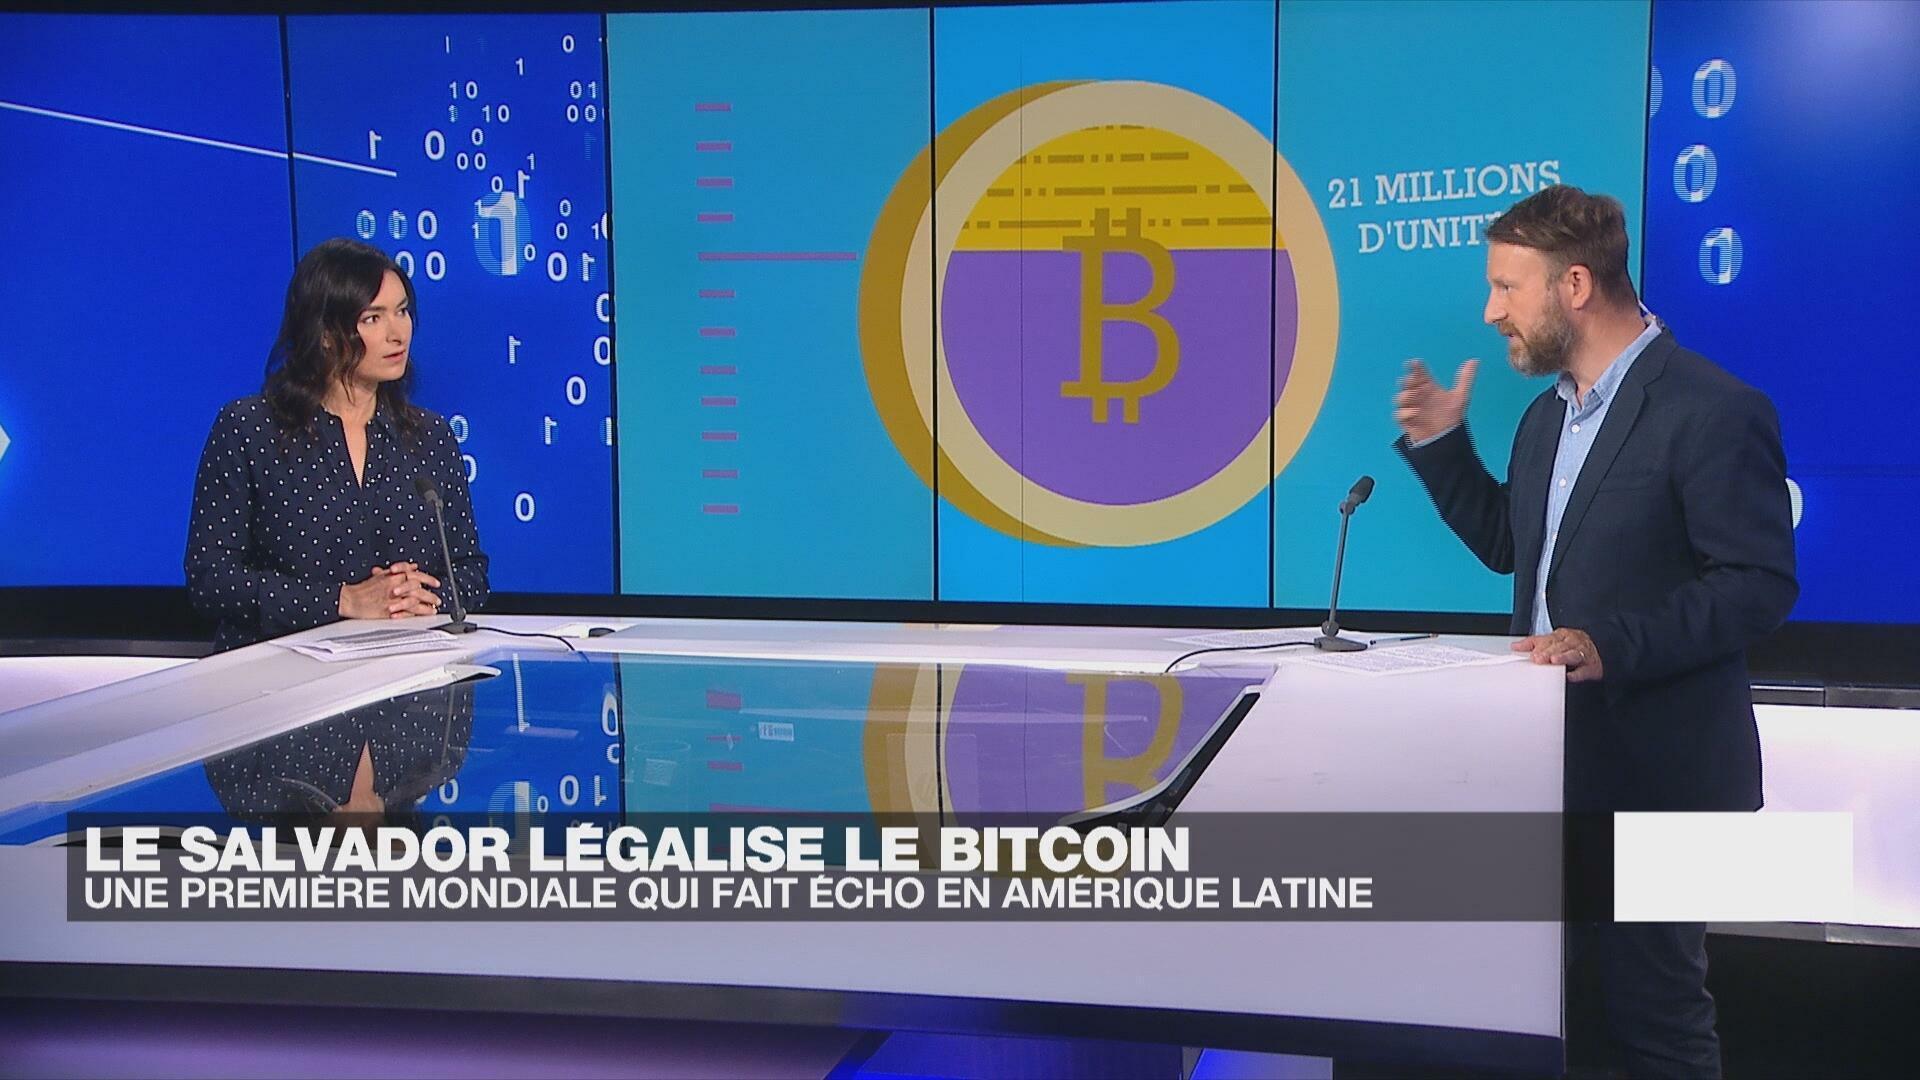 Le Salvador fait sa crypto-révolution : vers une Internationale du bitcoin ?